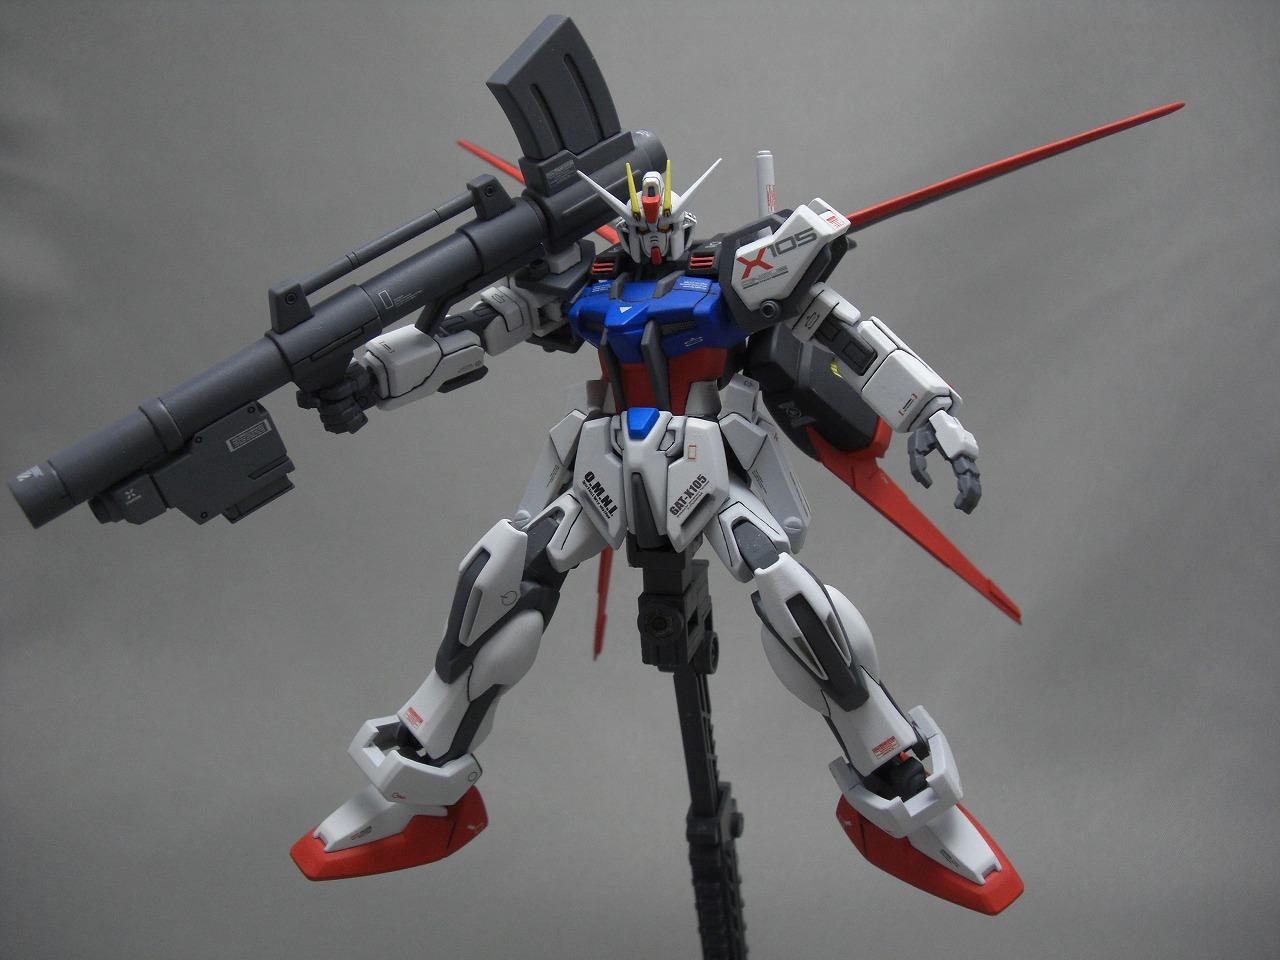 GAT-X105(160)